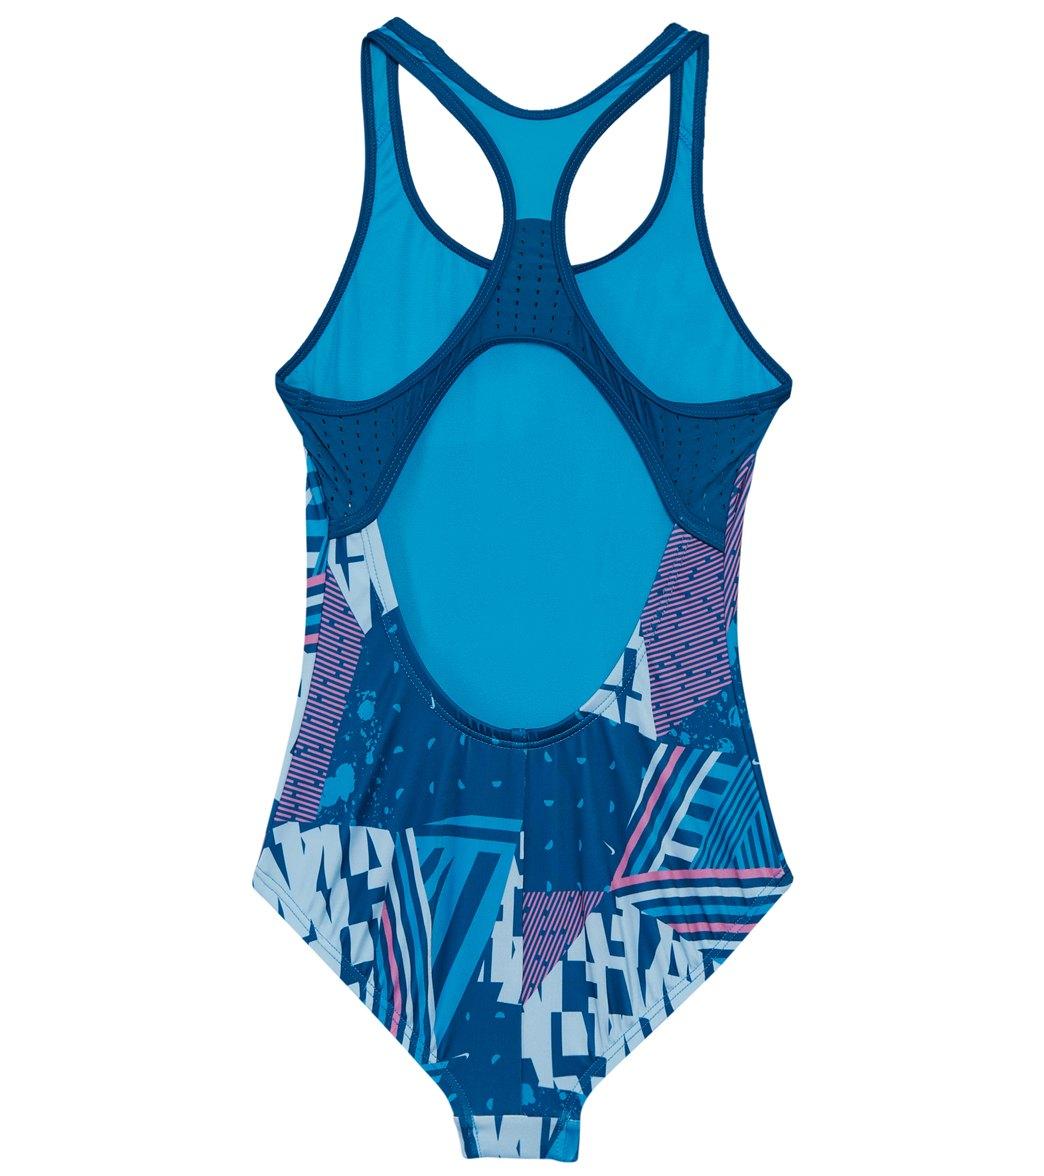 e187221a9a0 Nike Girls' Mash Up Racerback One Piece Swimsuit (Big Kid)